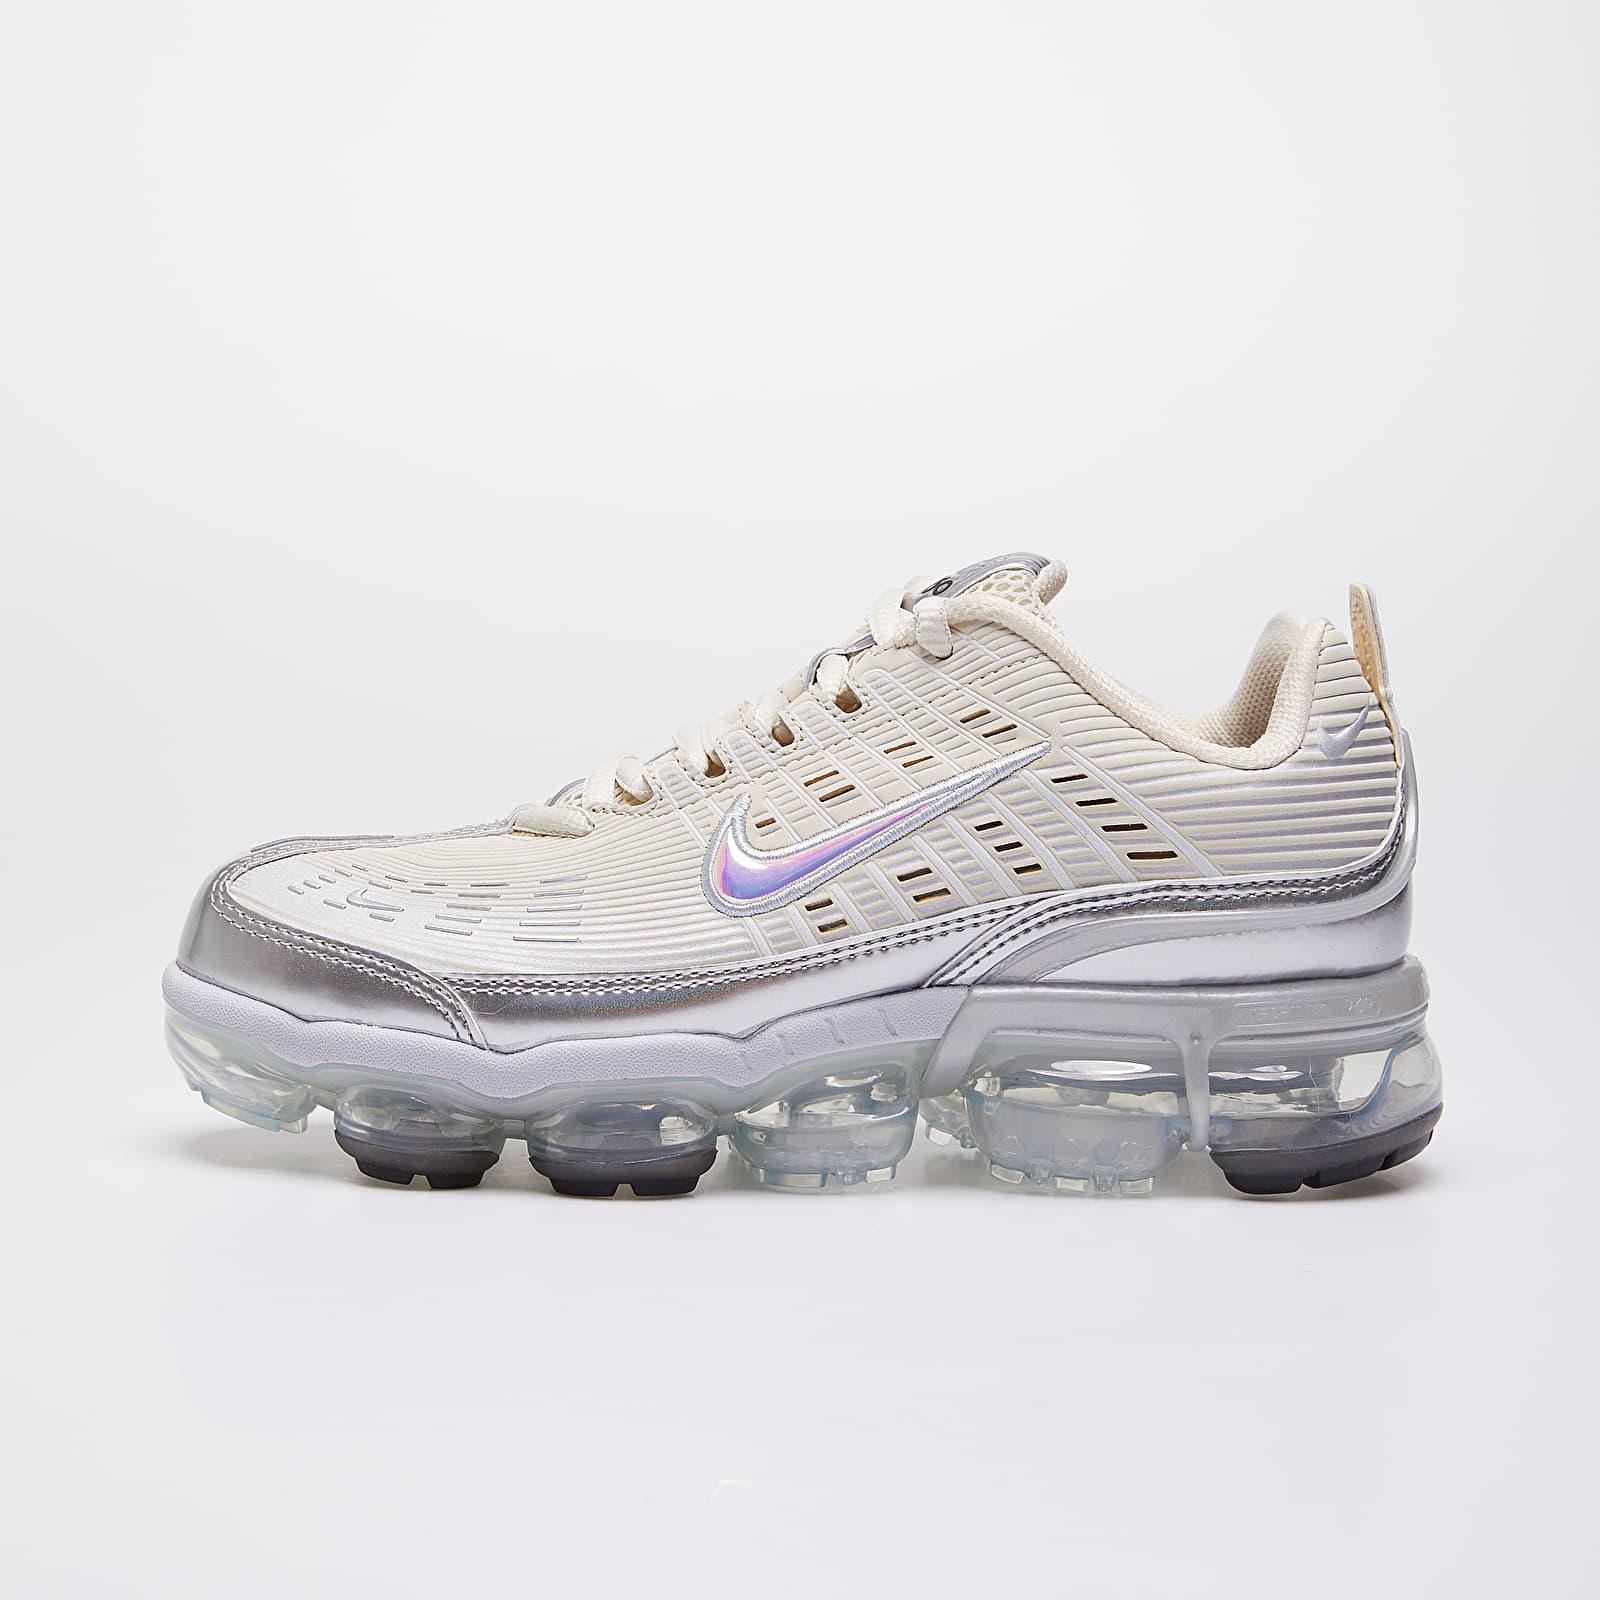 Women's shoes Nike W Air Vapormax 360 Fossil/ Metallic Silver-Black